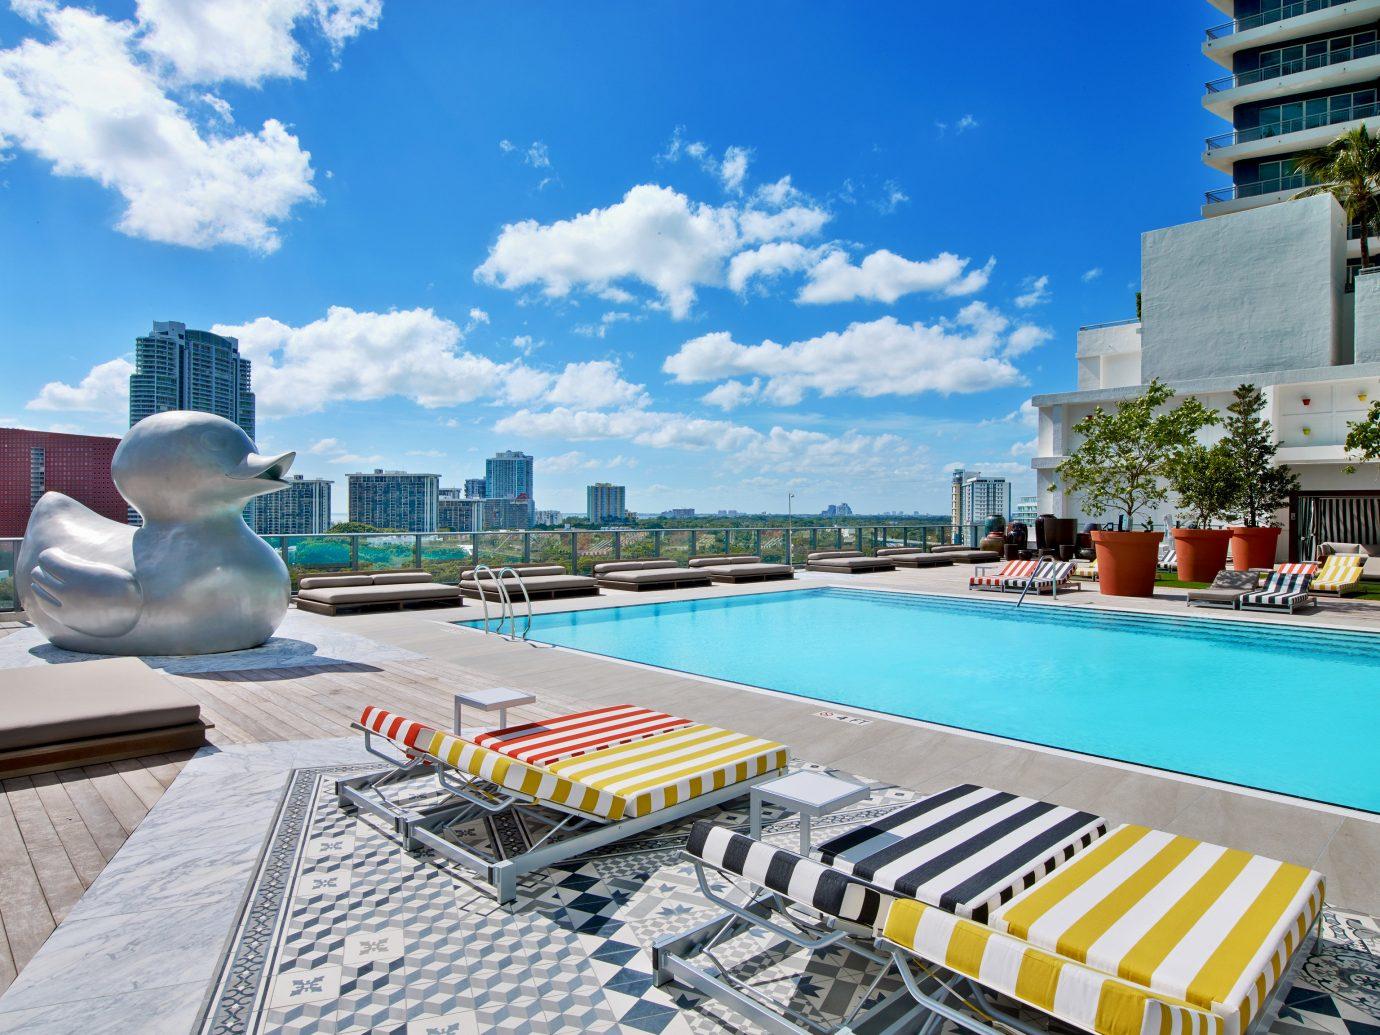 Hotels Trip Ideas Winter sky outdoor leisure swimming pool property condominium leisure centre Resort plaza Water park estate